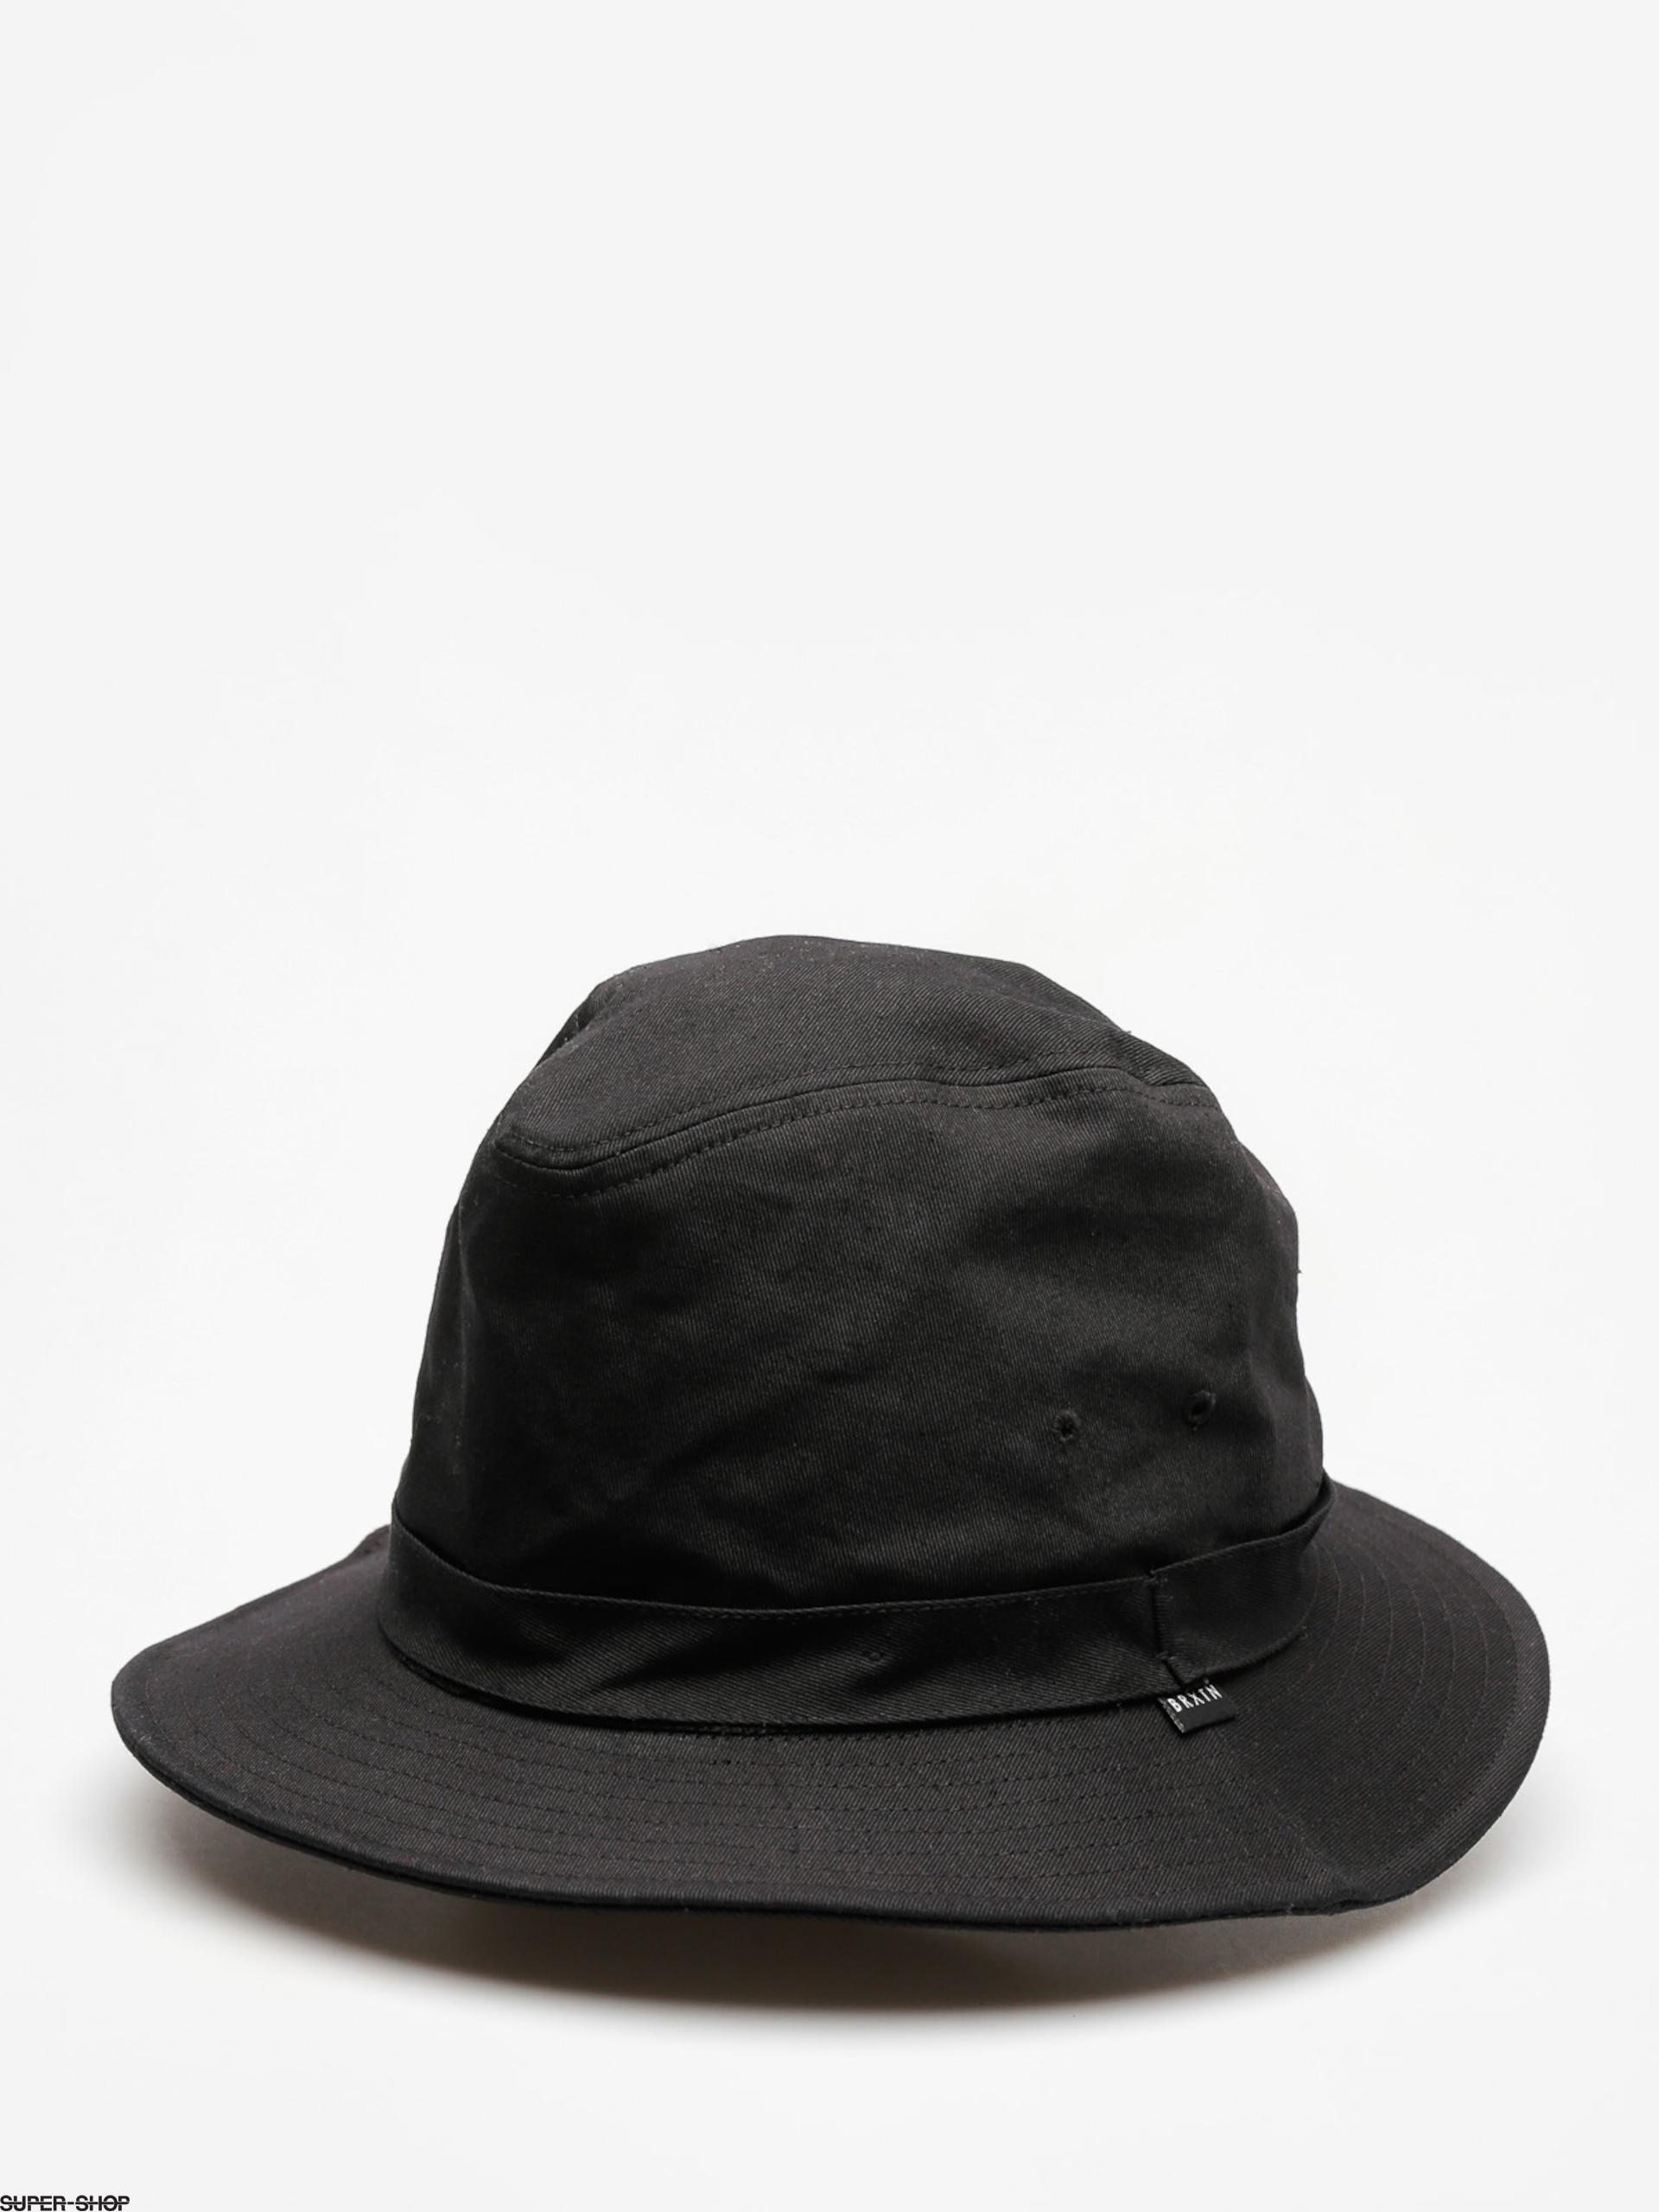 5ce4c96b17f8a 912368-w1920-brixton-hat-ronson-fedora-black.jpg